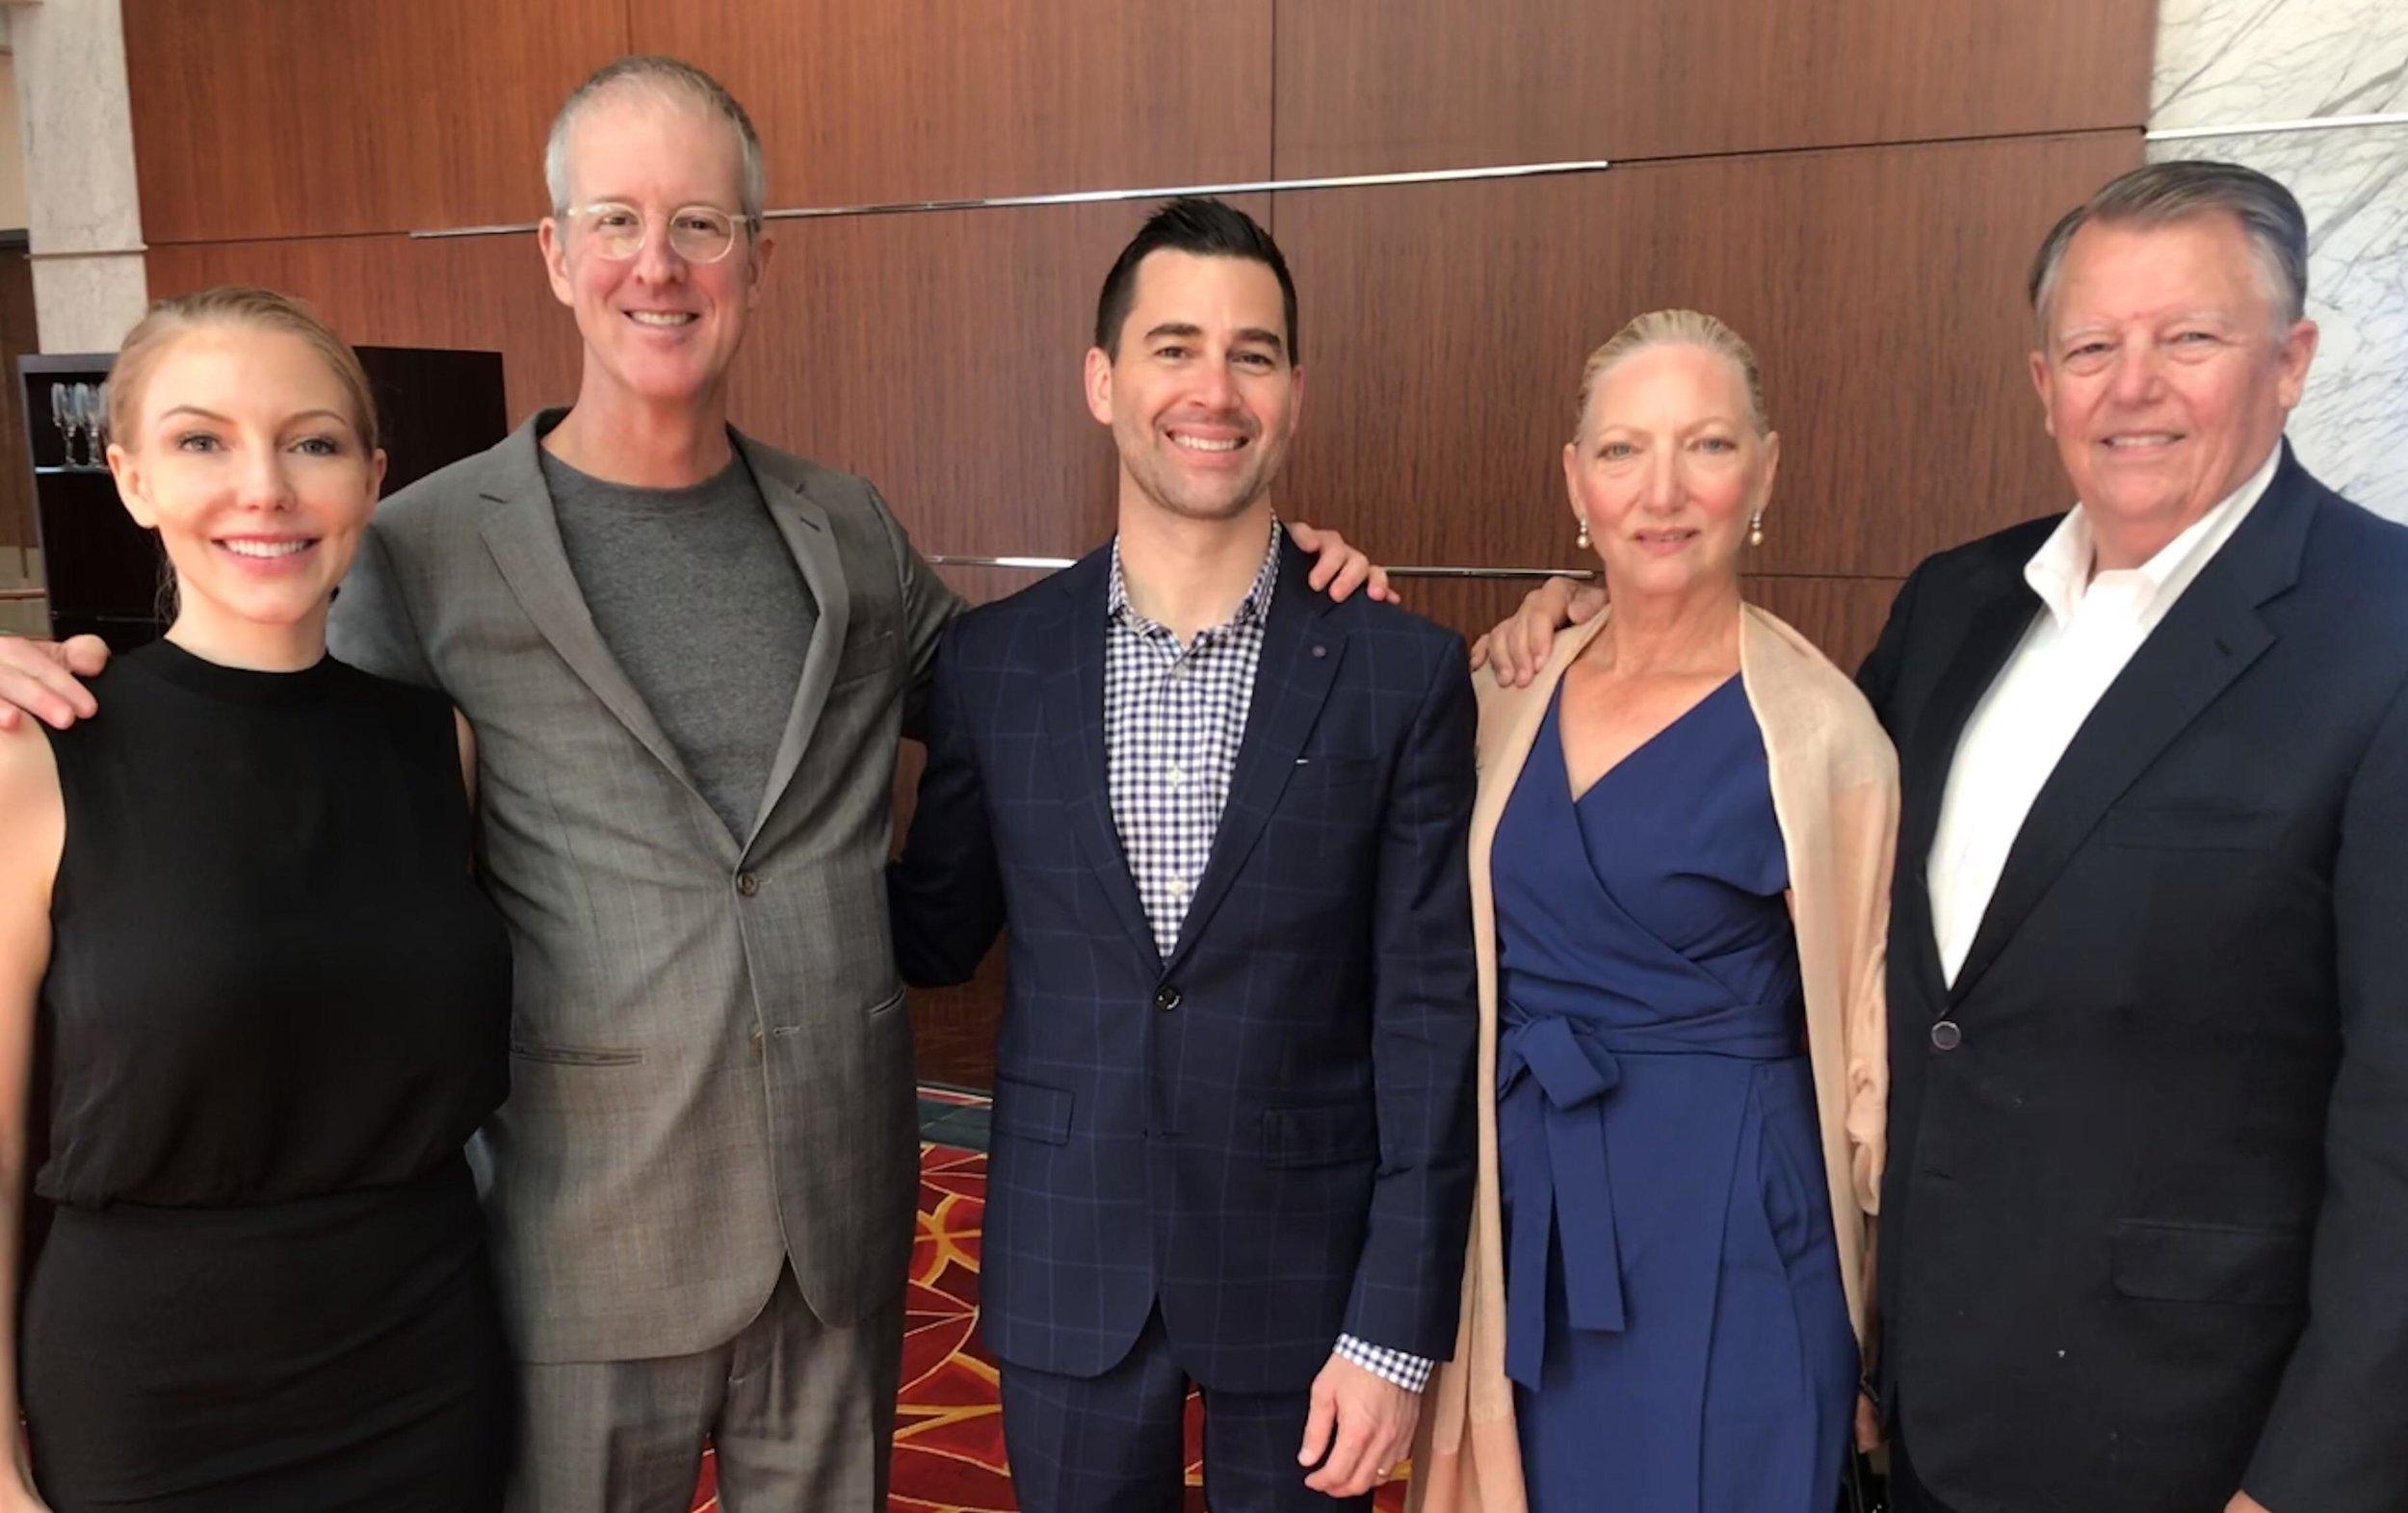 From Left: Heather Huffman (NAI), Jeff Speck (Speck & Associates), Christopher Huffman (Lafayette Land), Doris Isakson, Bob Isakson (Lafayette Land). Photo taken September 14, 2018.